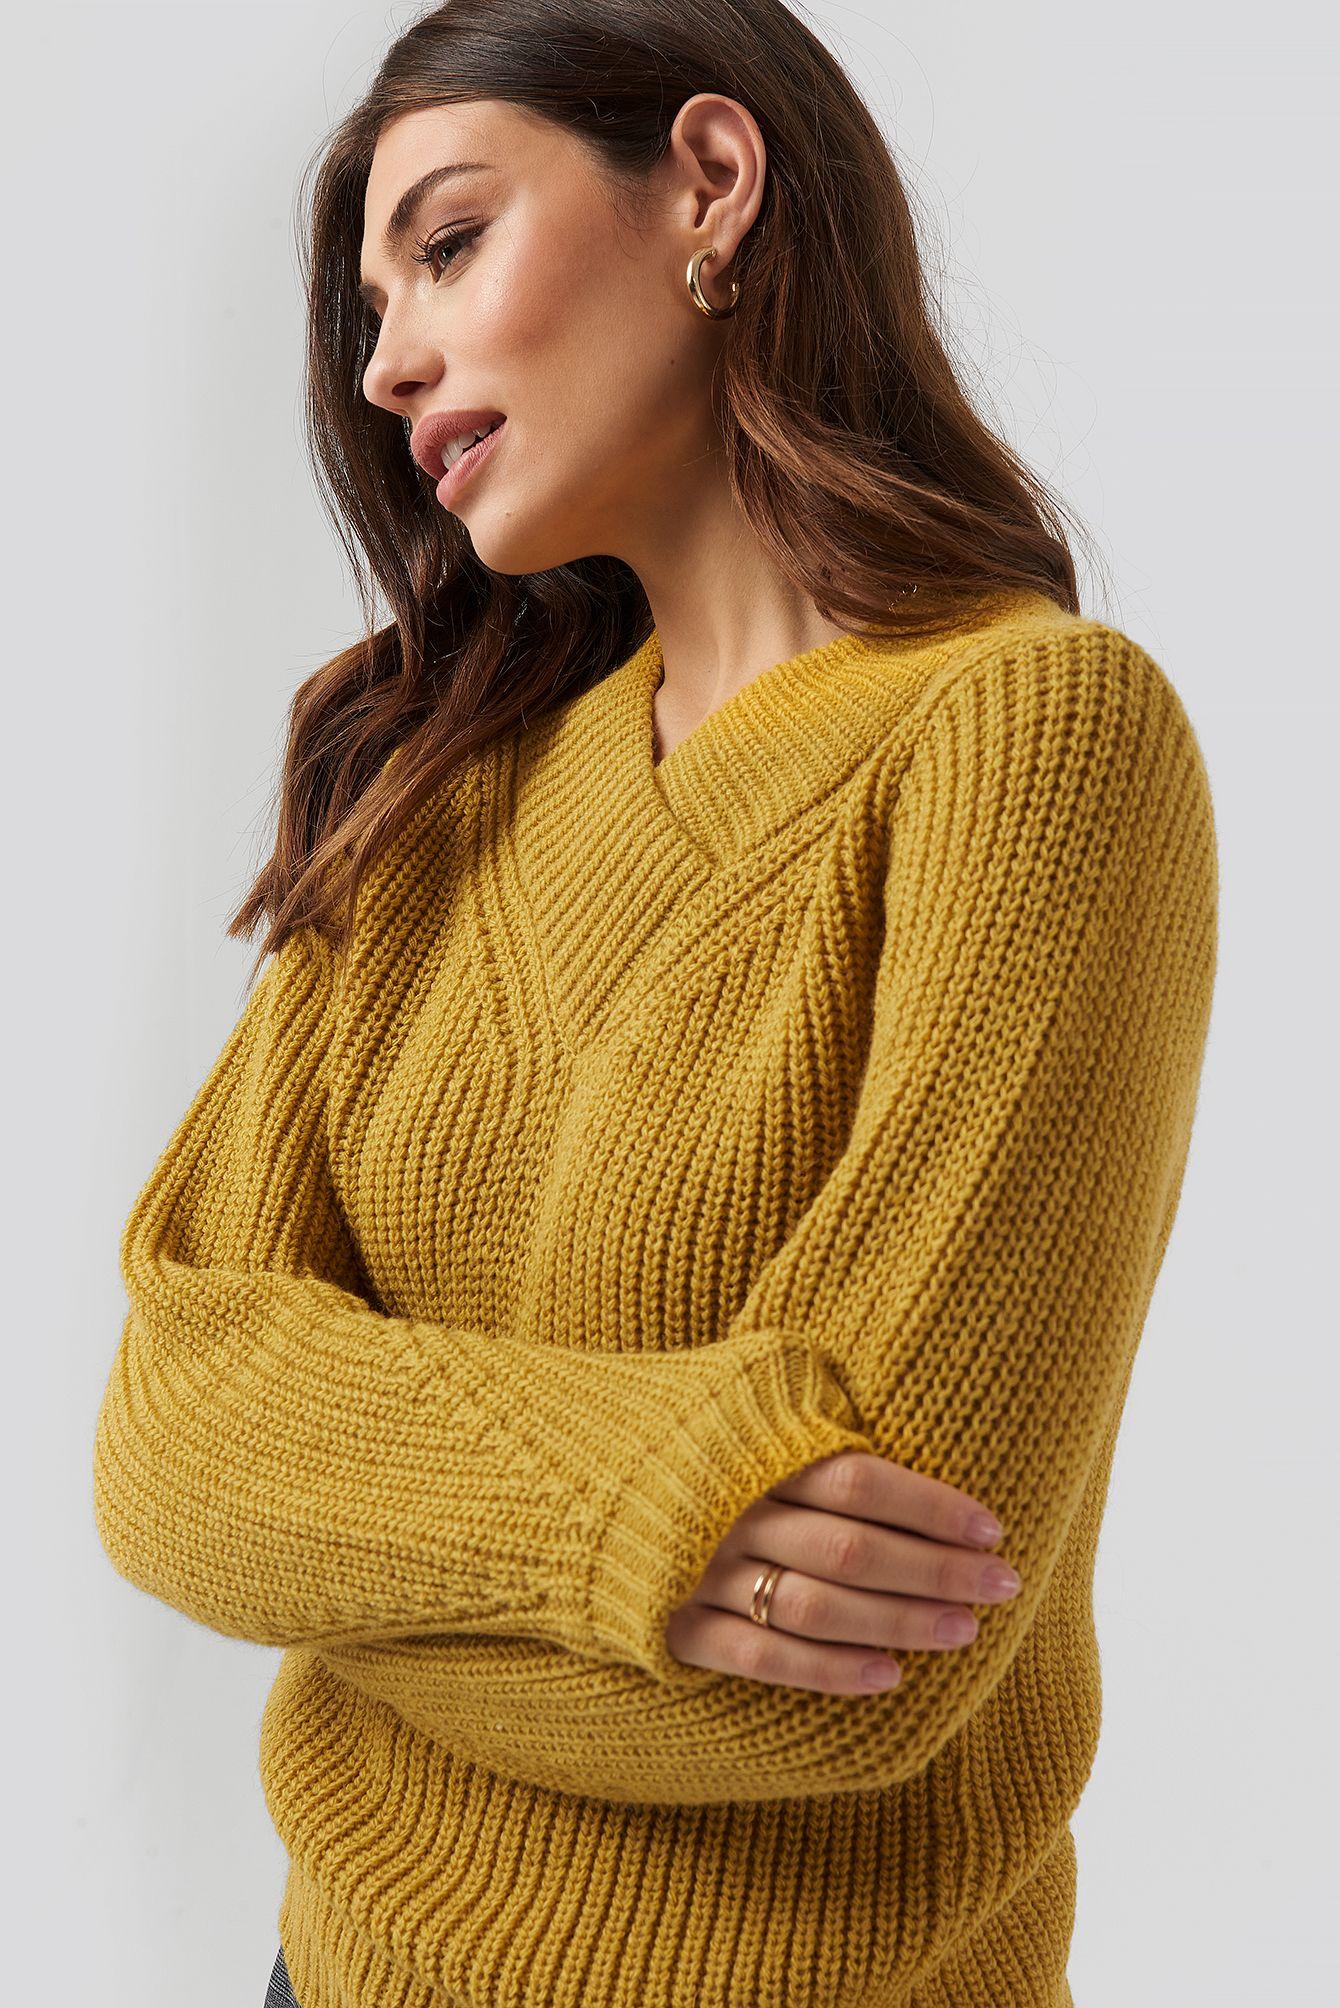 Wide Band V Neck Ribbed Sweater In 2020 Gelber Pullover Lange Armel Pullover